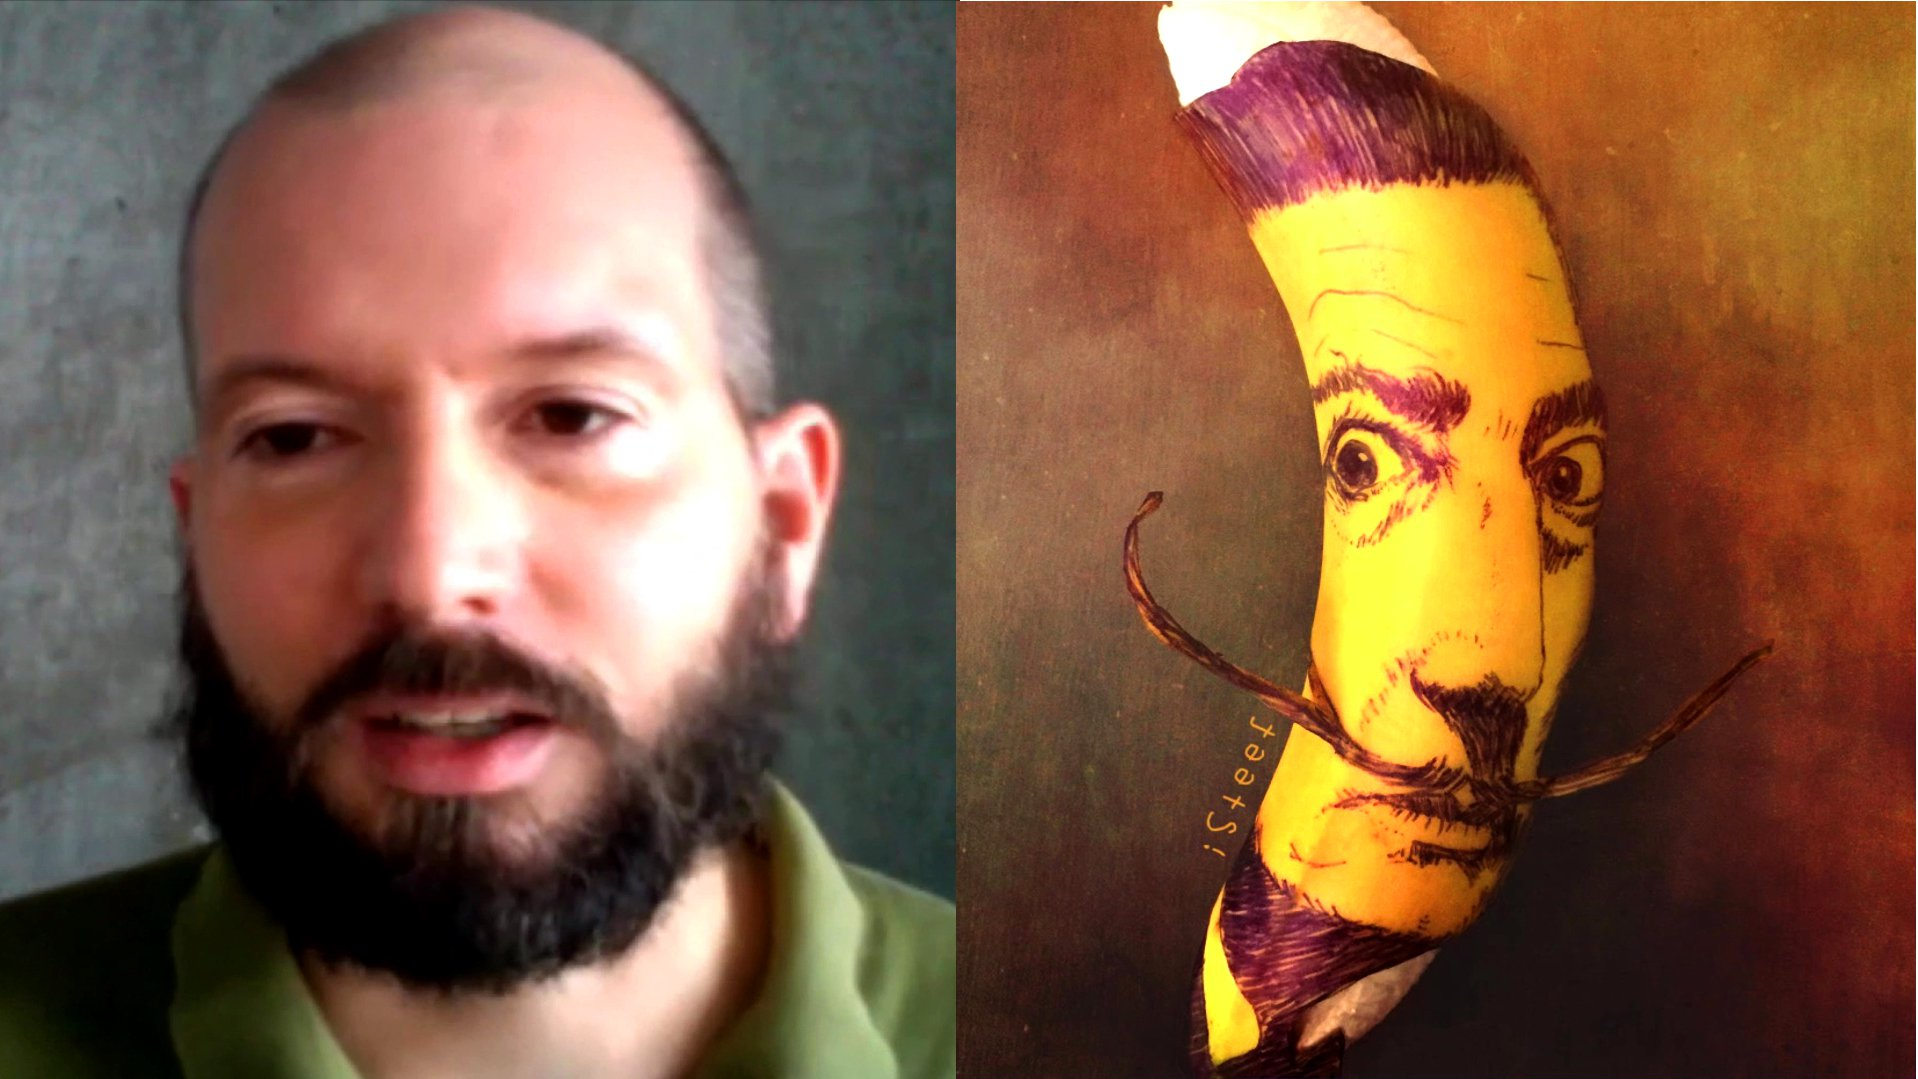 Bananen-Kunst: Dieser Mann verwandelt Obst in Kunstwerke